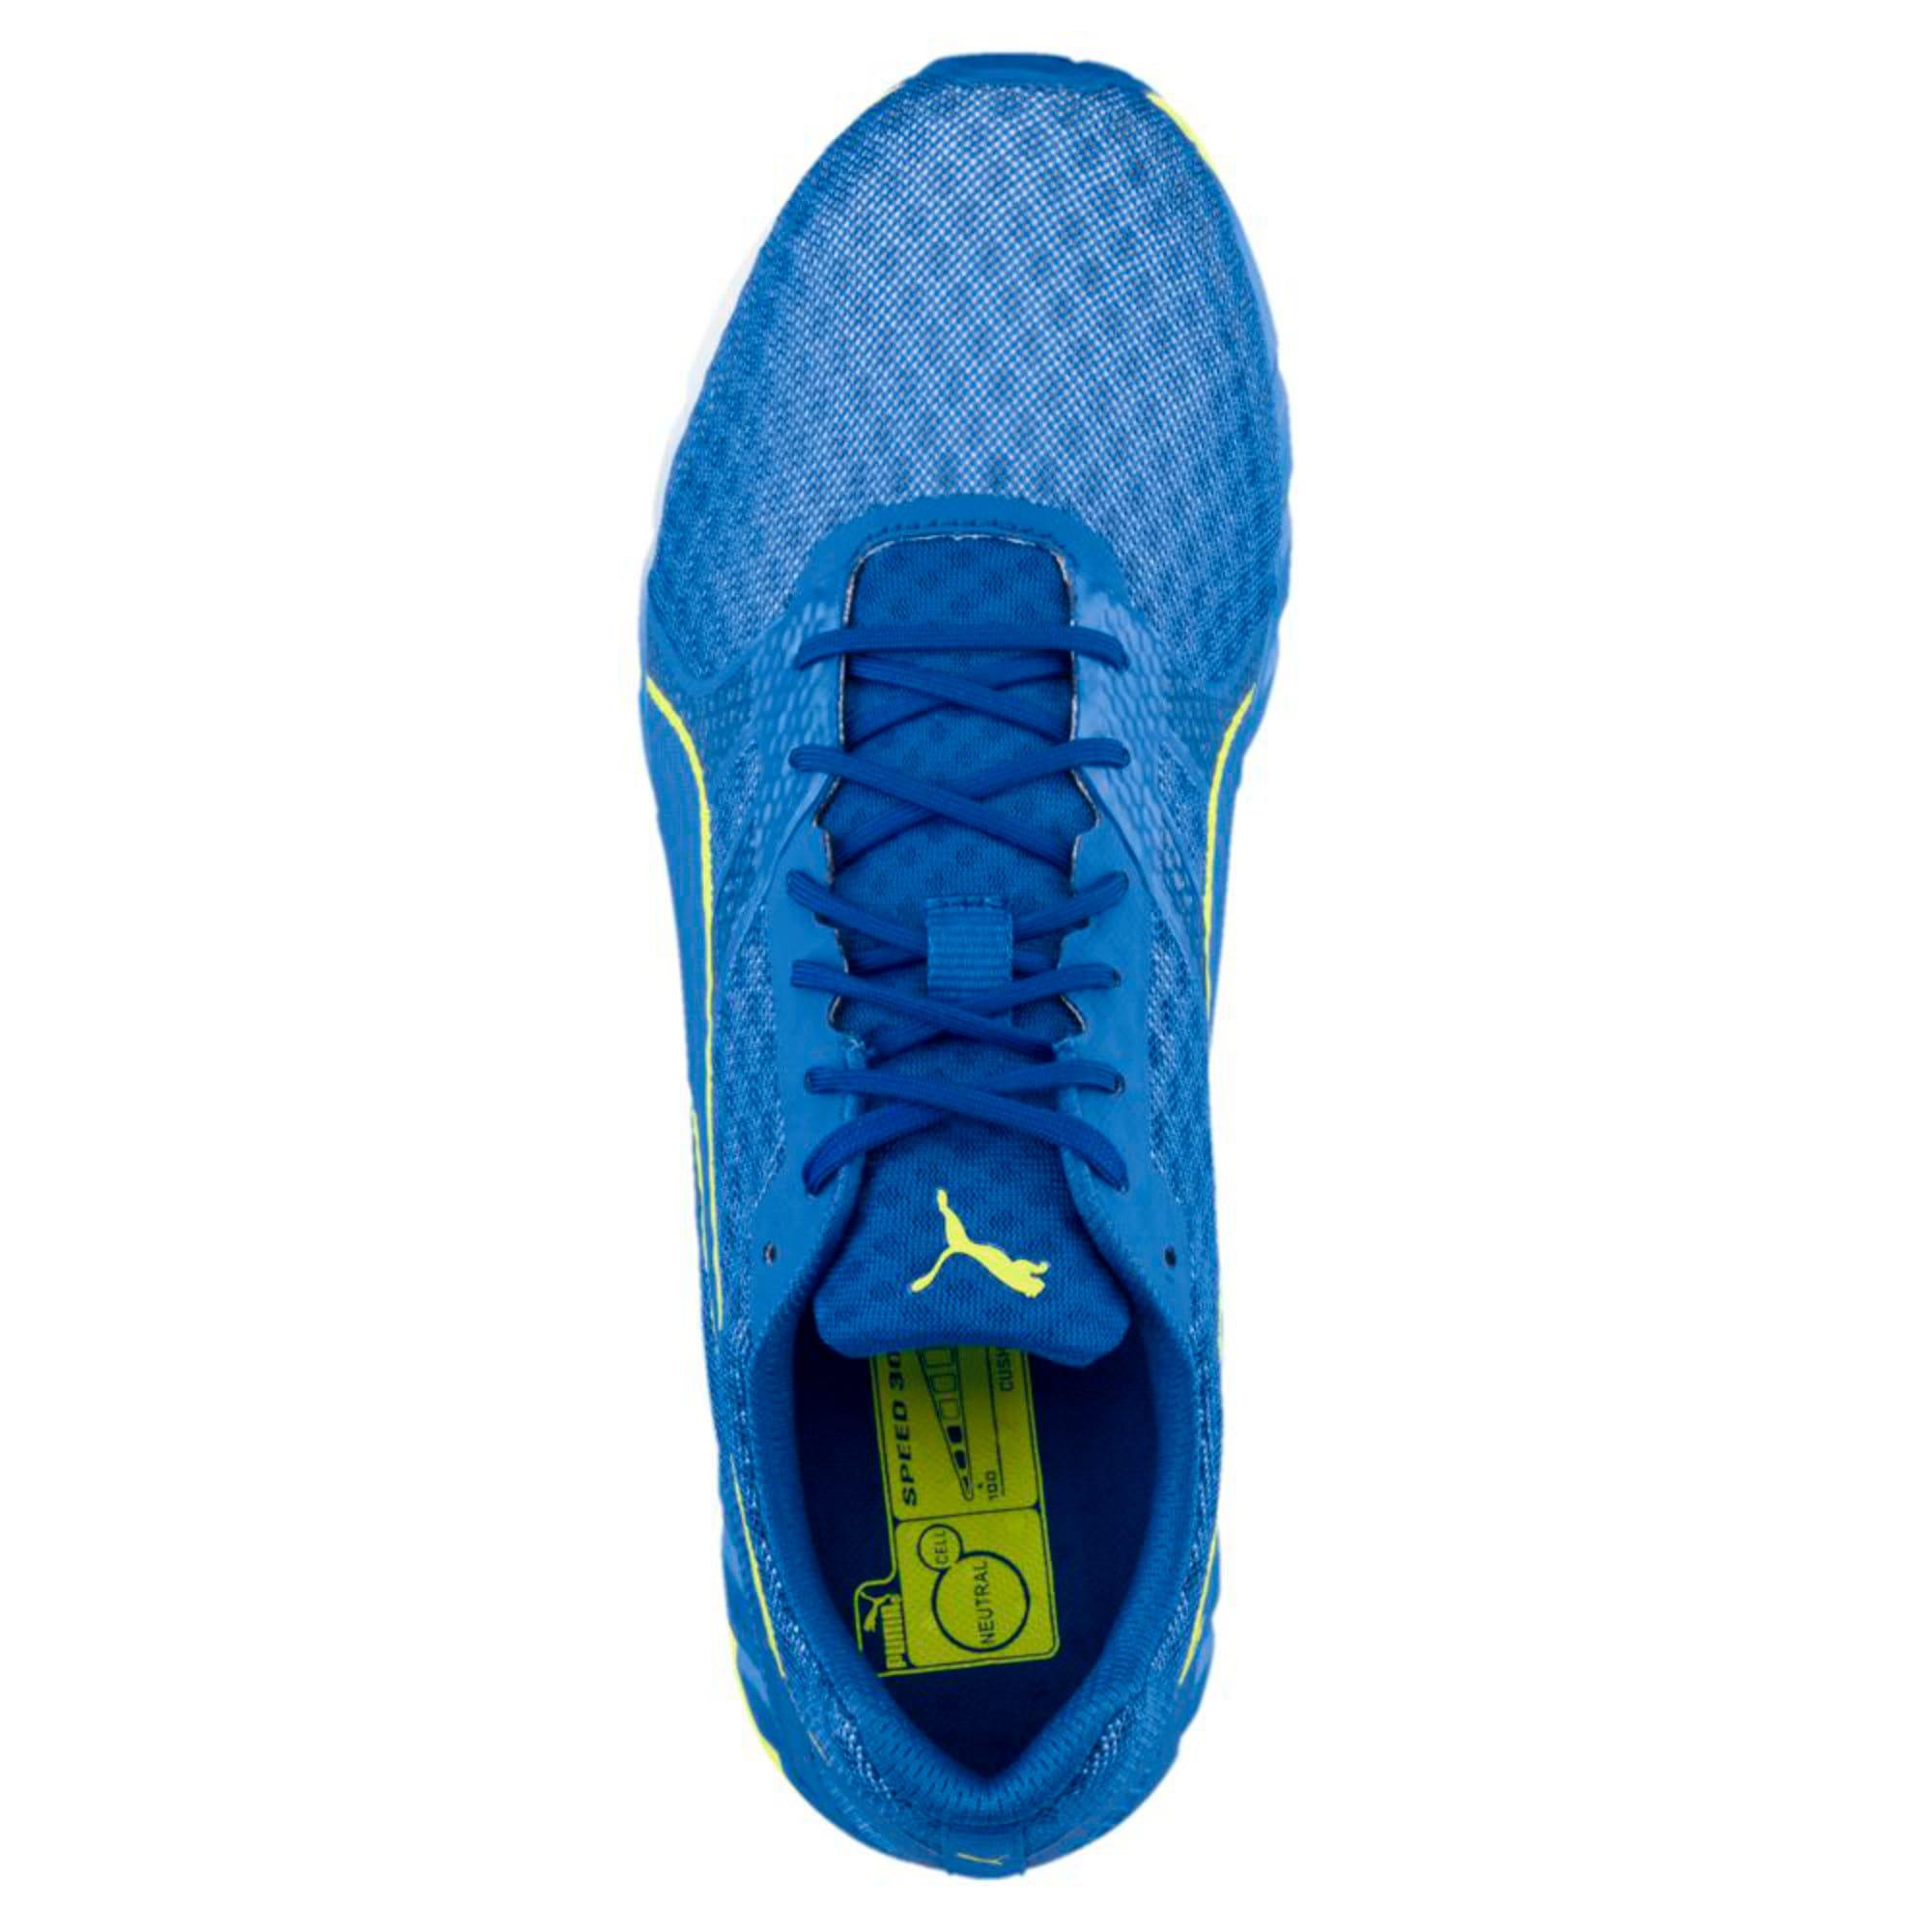 Thumbnail 5 of Speed 300 IGNITE 3 Men's Running Shoes, Turkish Sea-Peacoat-Yellow, medium-IND